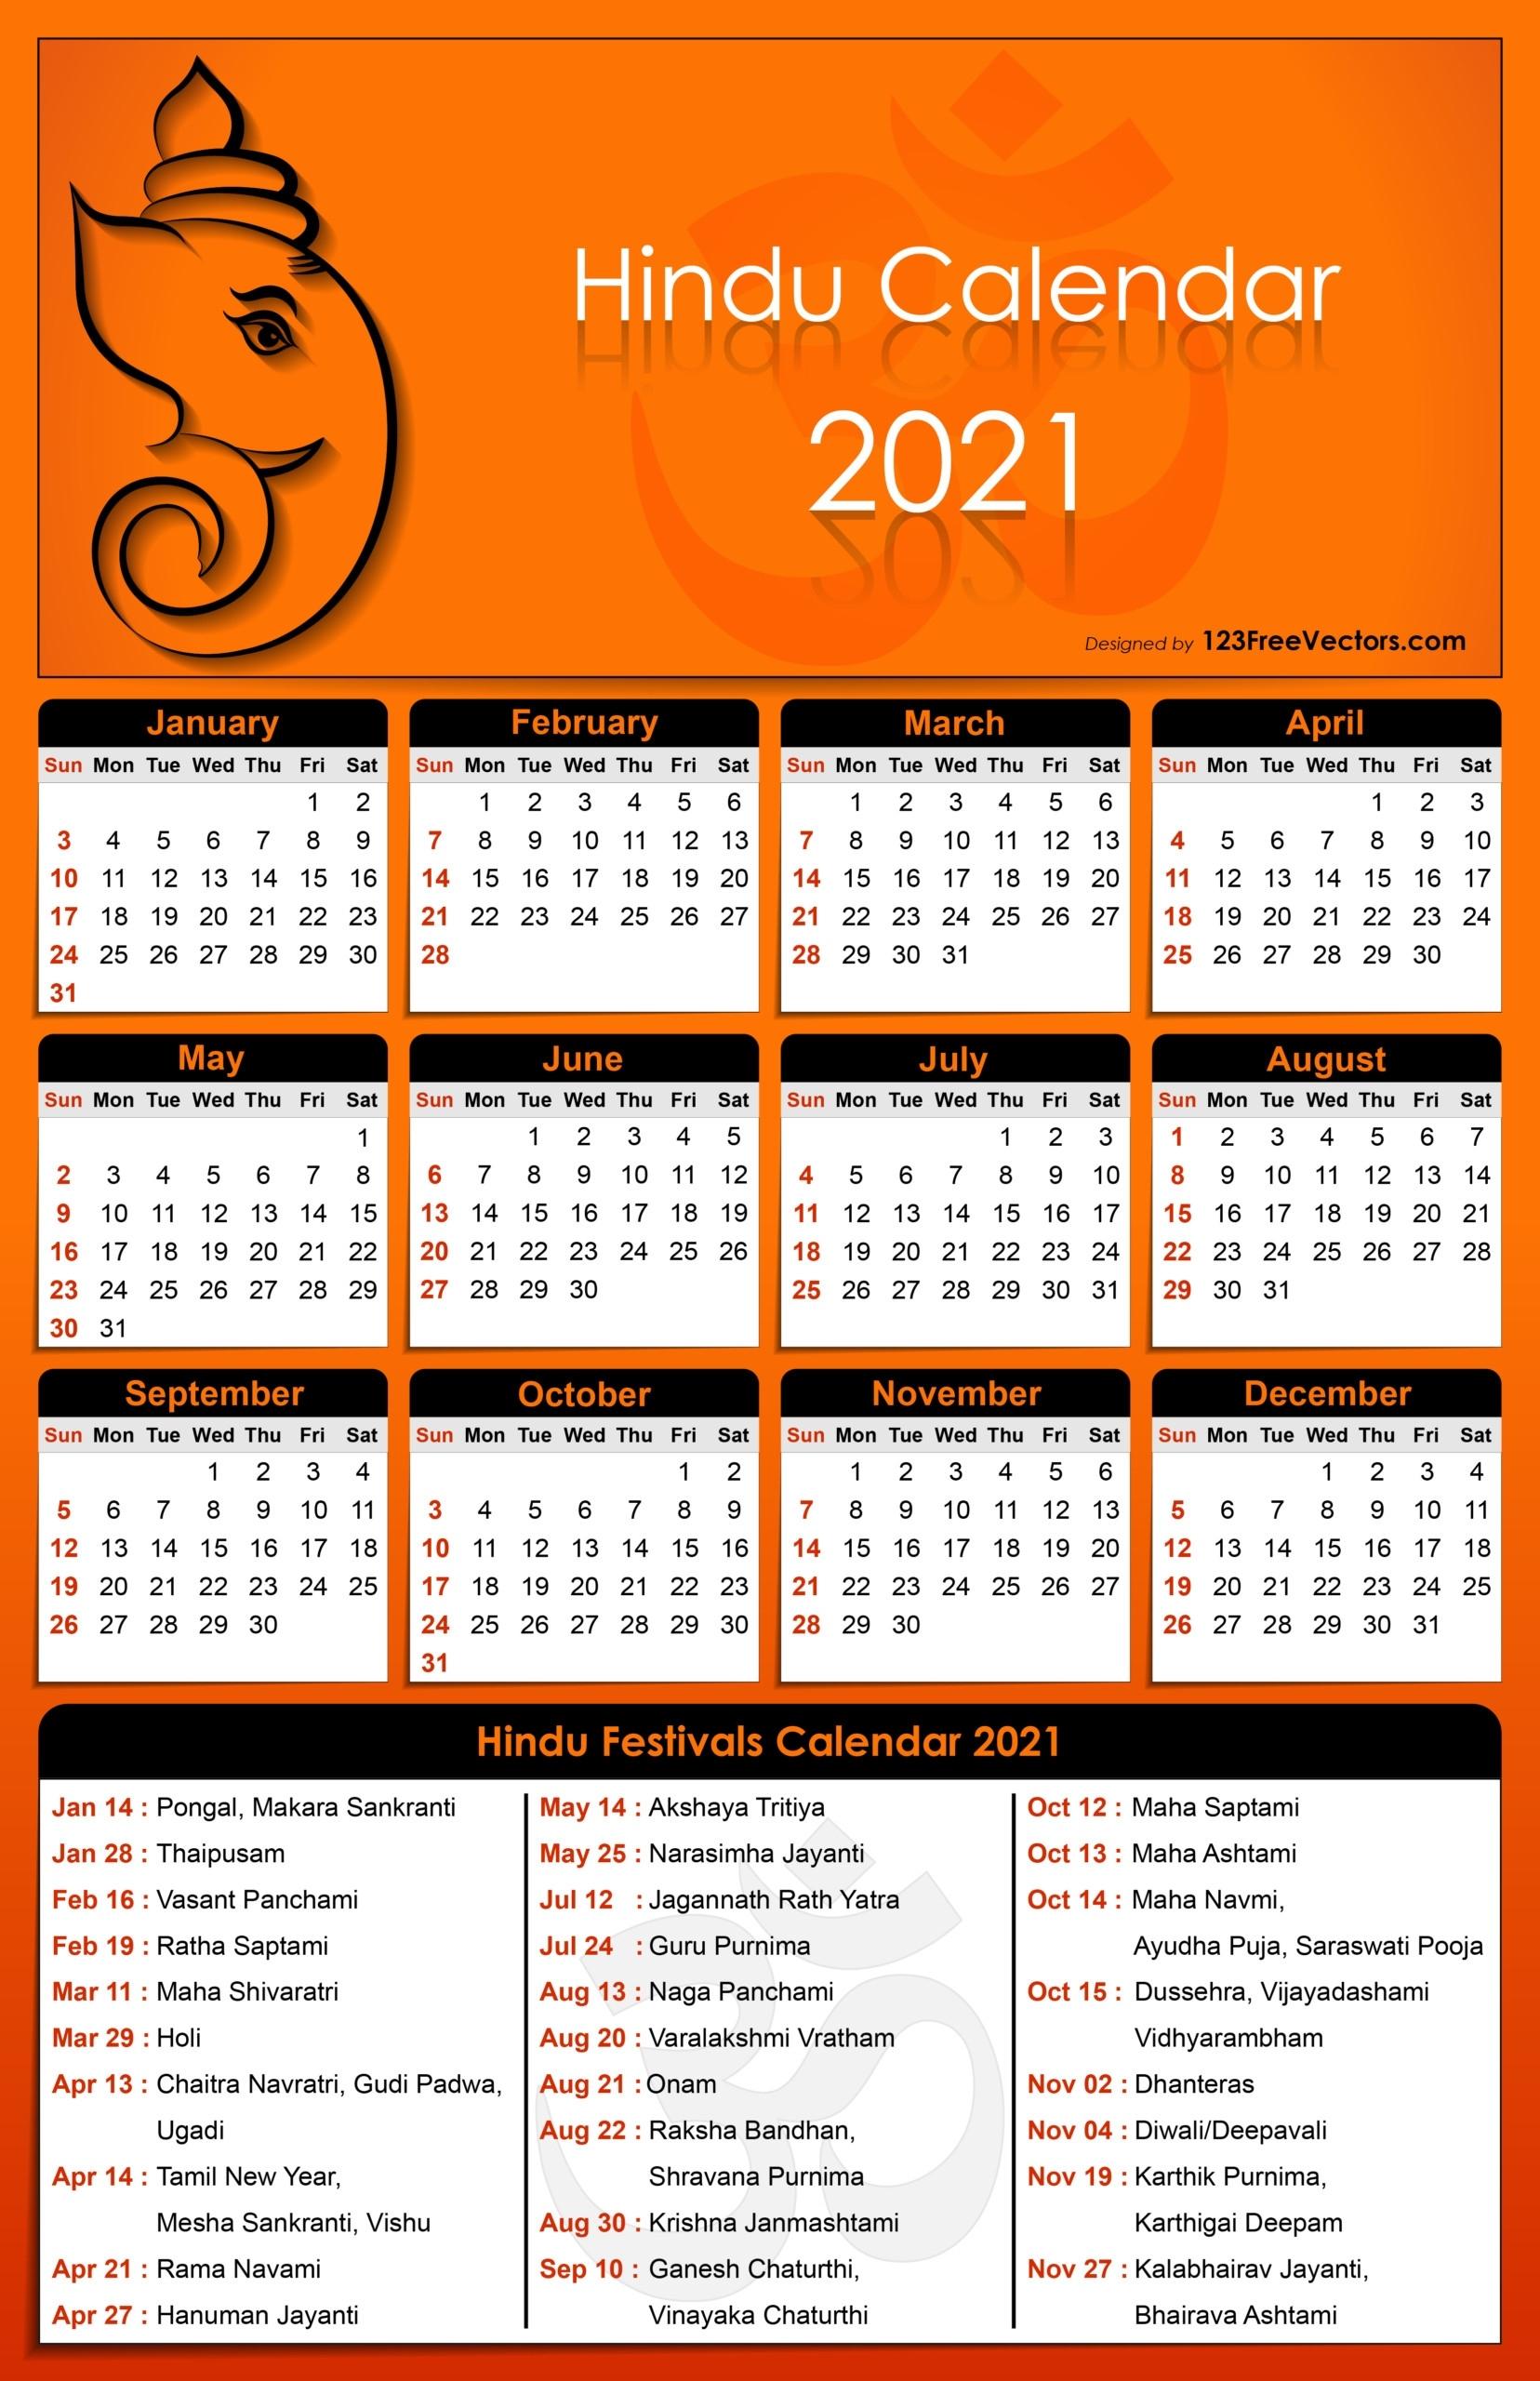 Hindu Calendar 2021 | Printable Calendars 2021 Gujarati Calendar September 2021 With Tithi